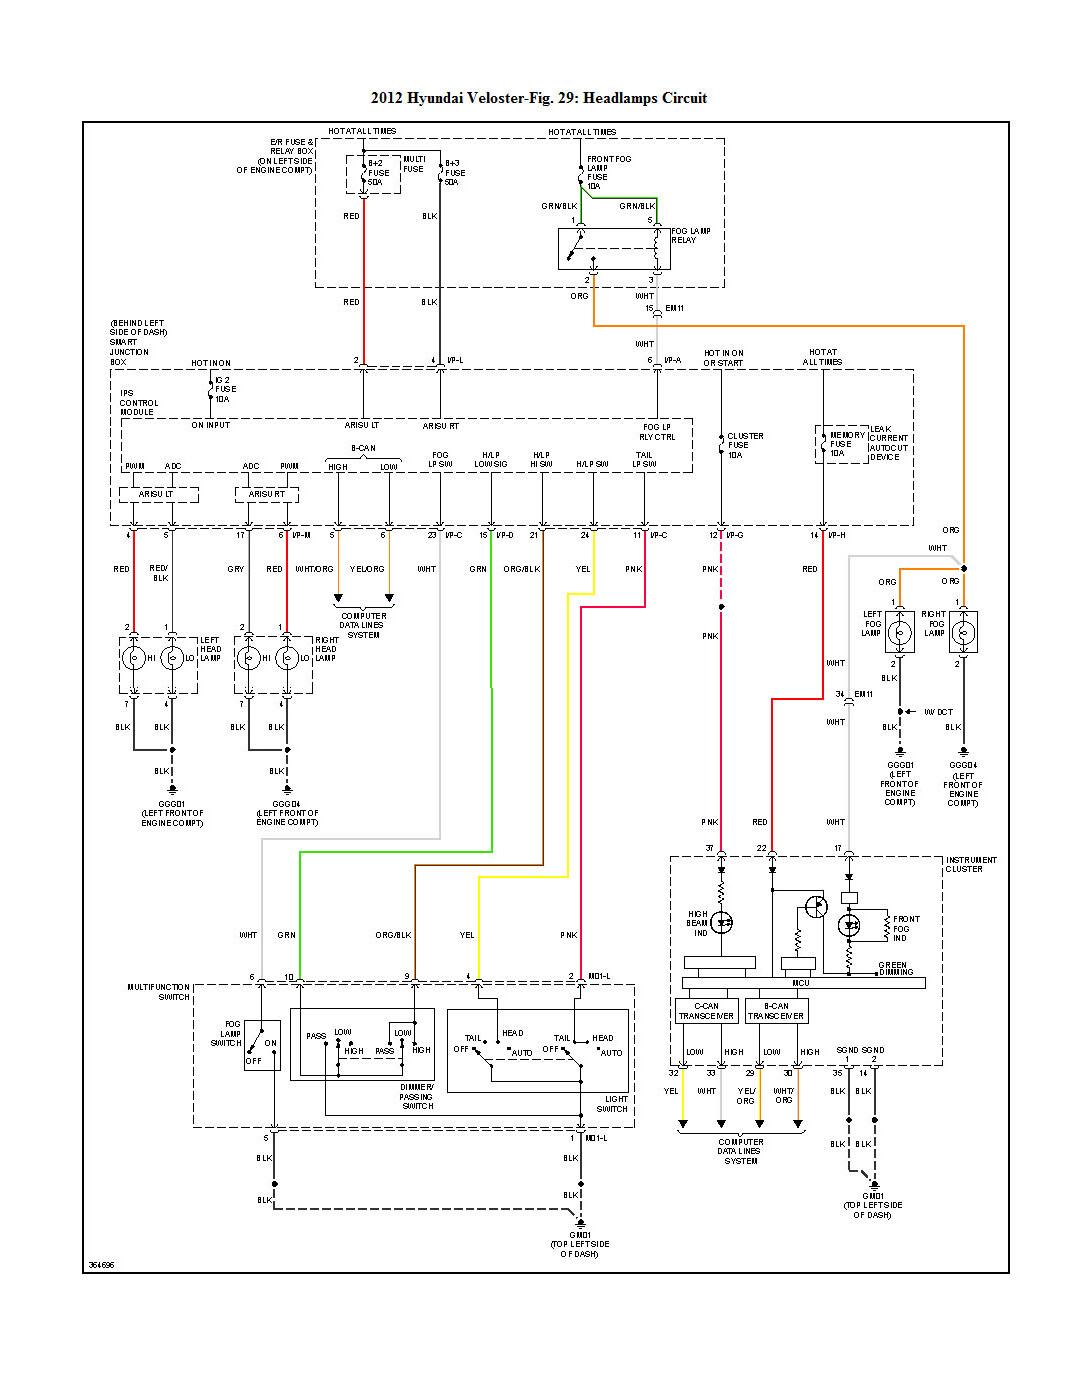 Lighting Wiring Diagram? | Veloster Forum on